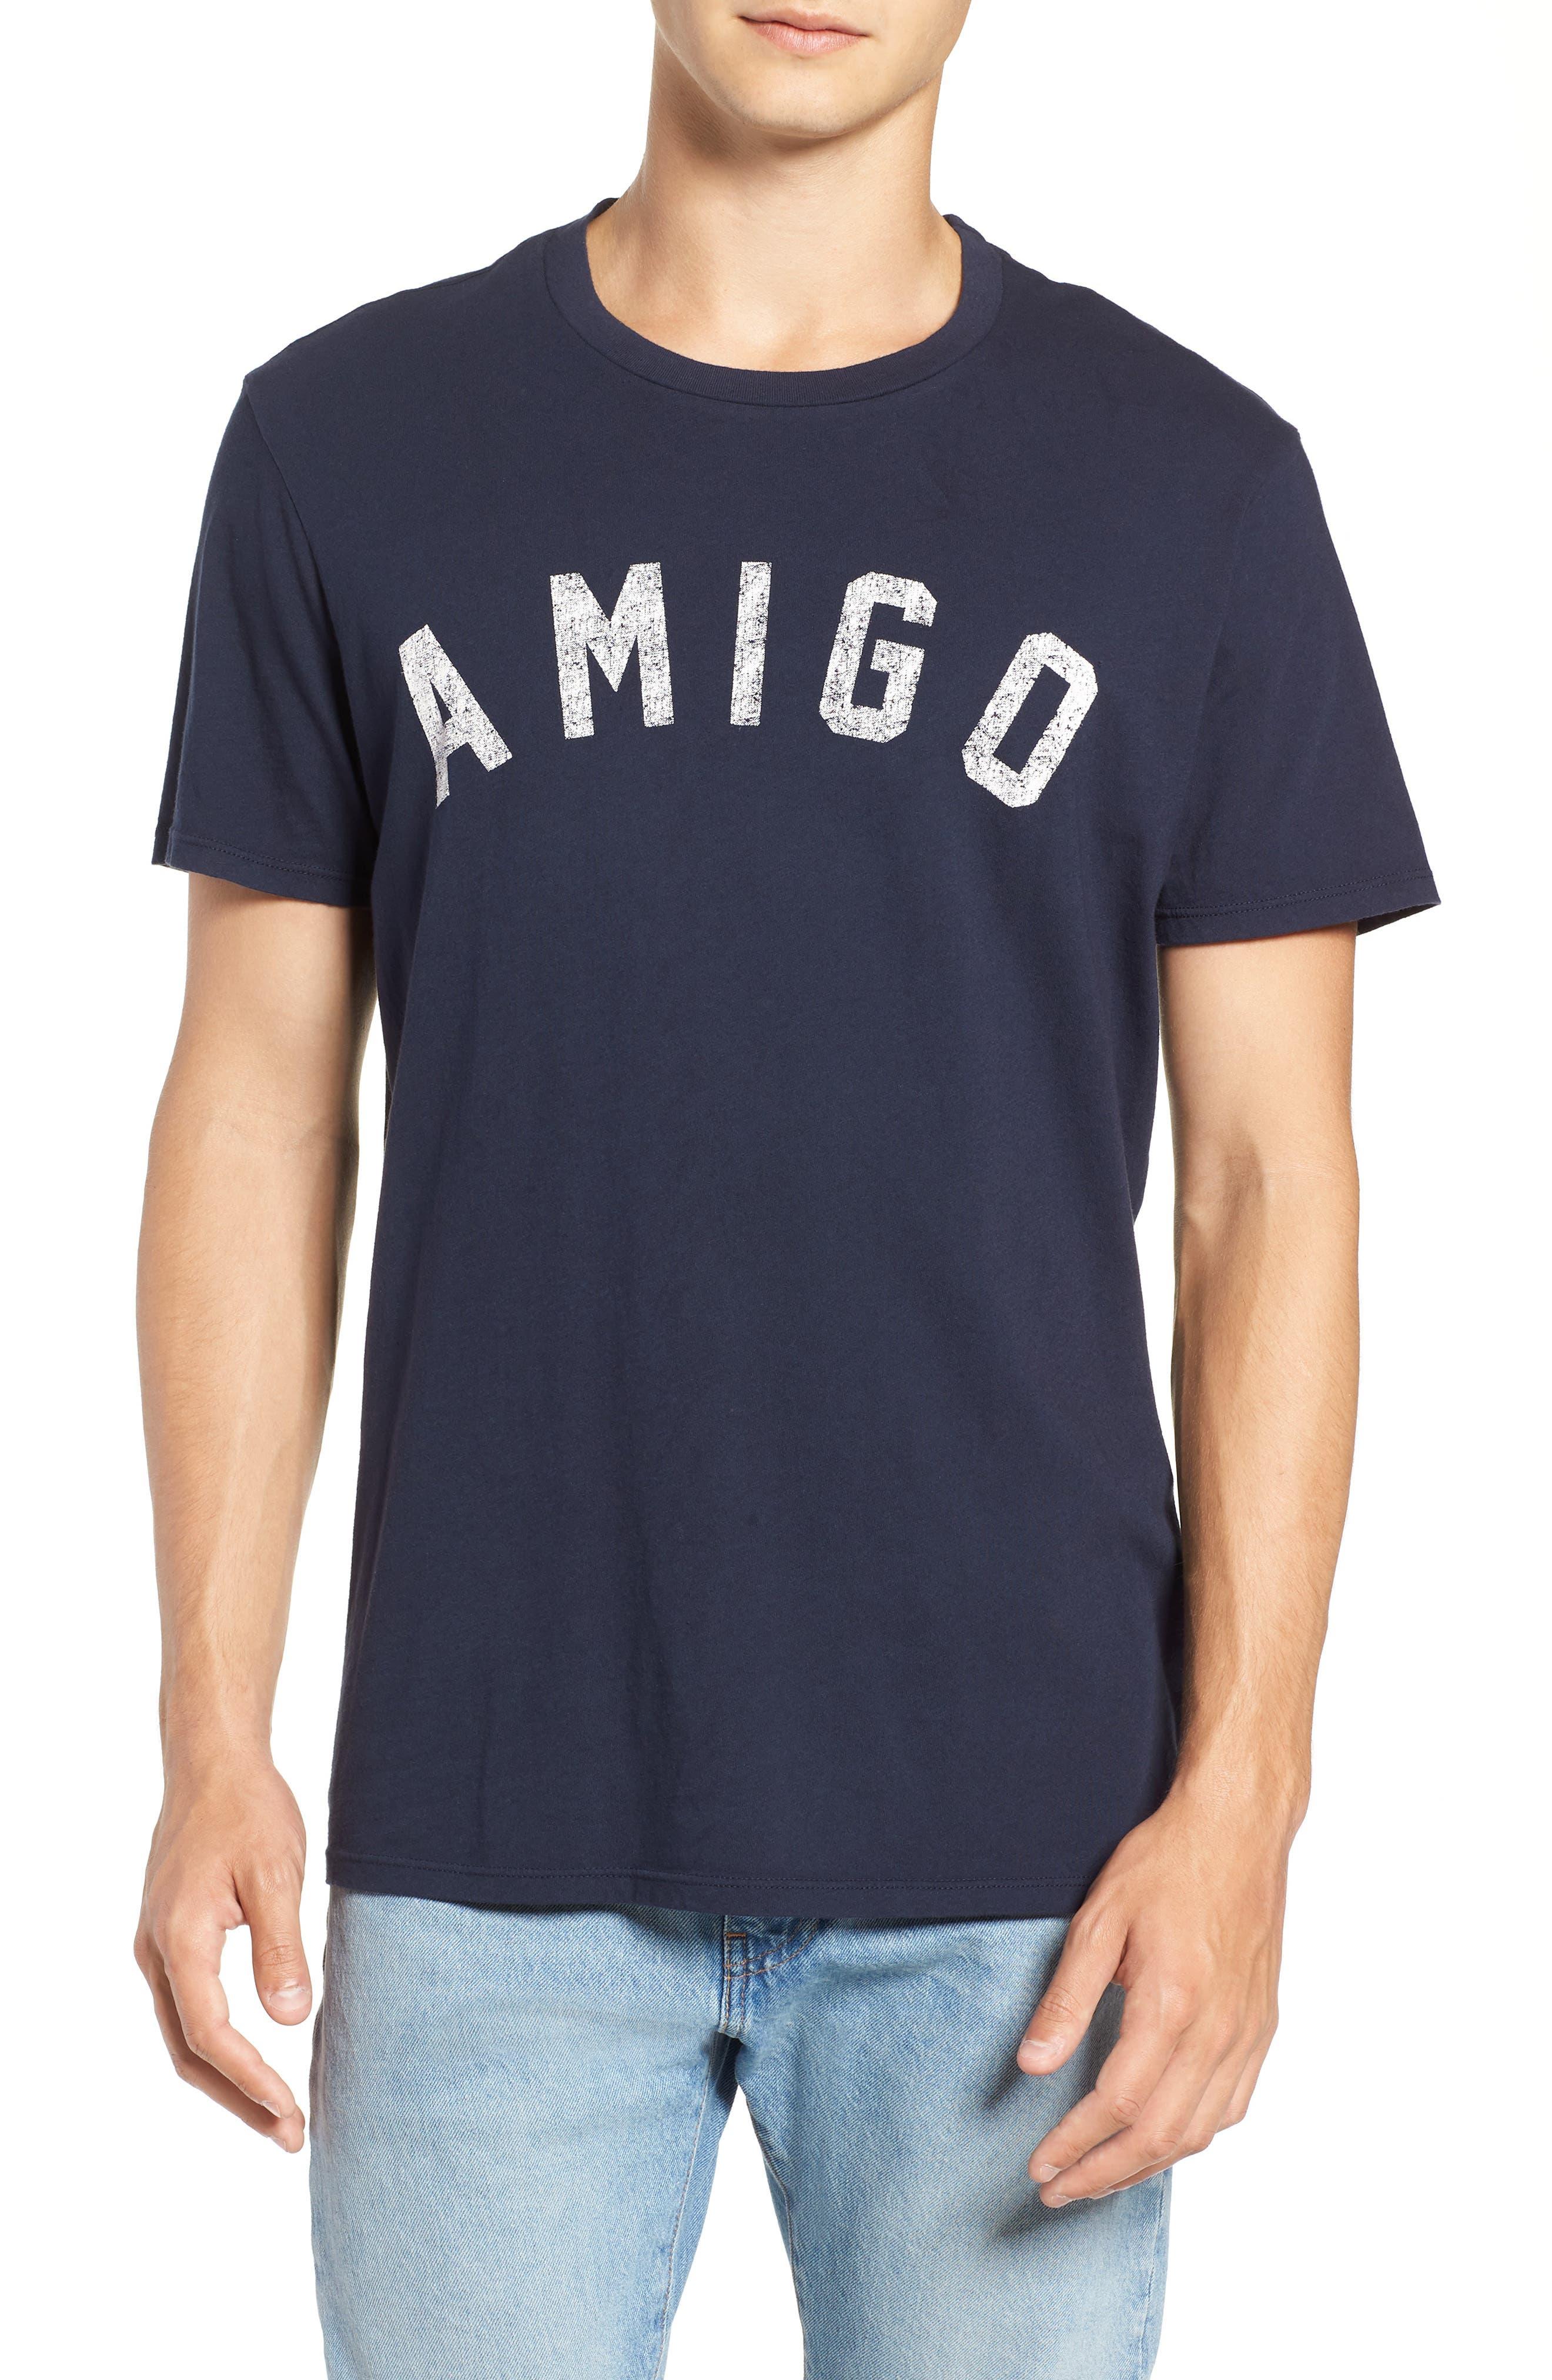 Amigo Graphic T-Shirt,                             Main thumbnail 1, color,                             400